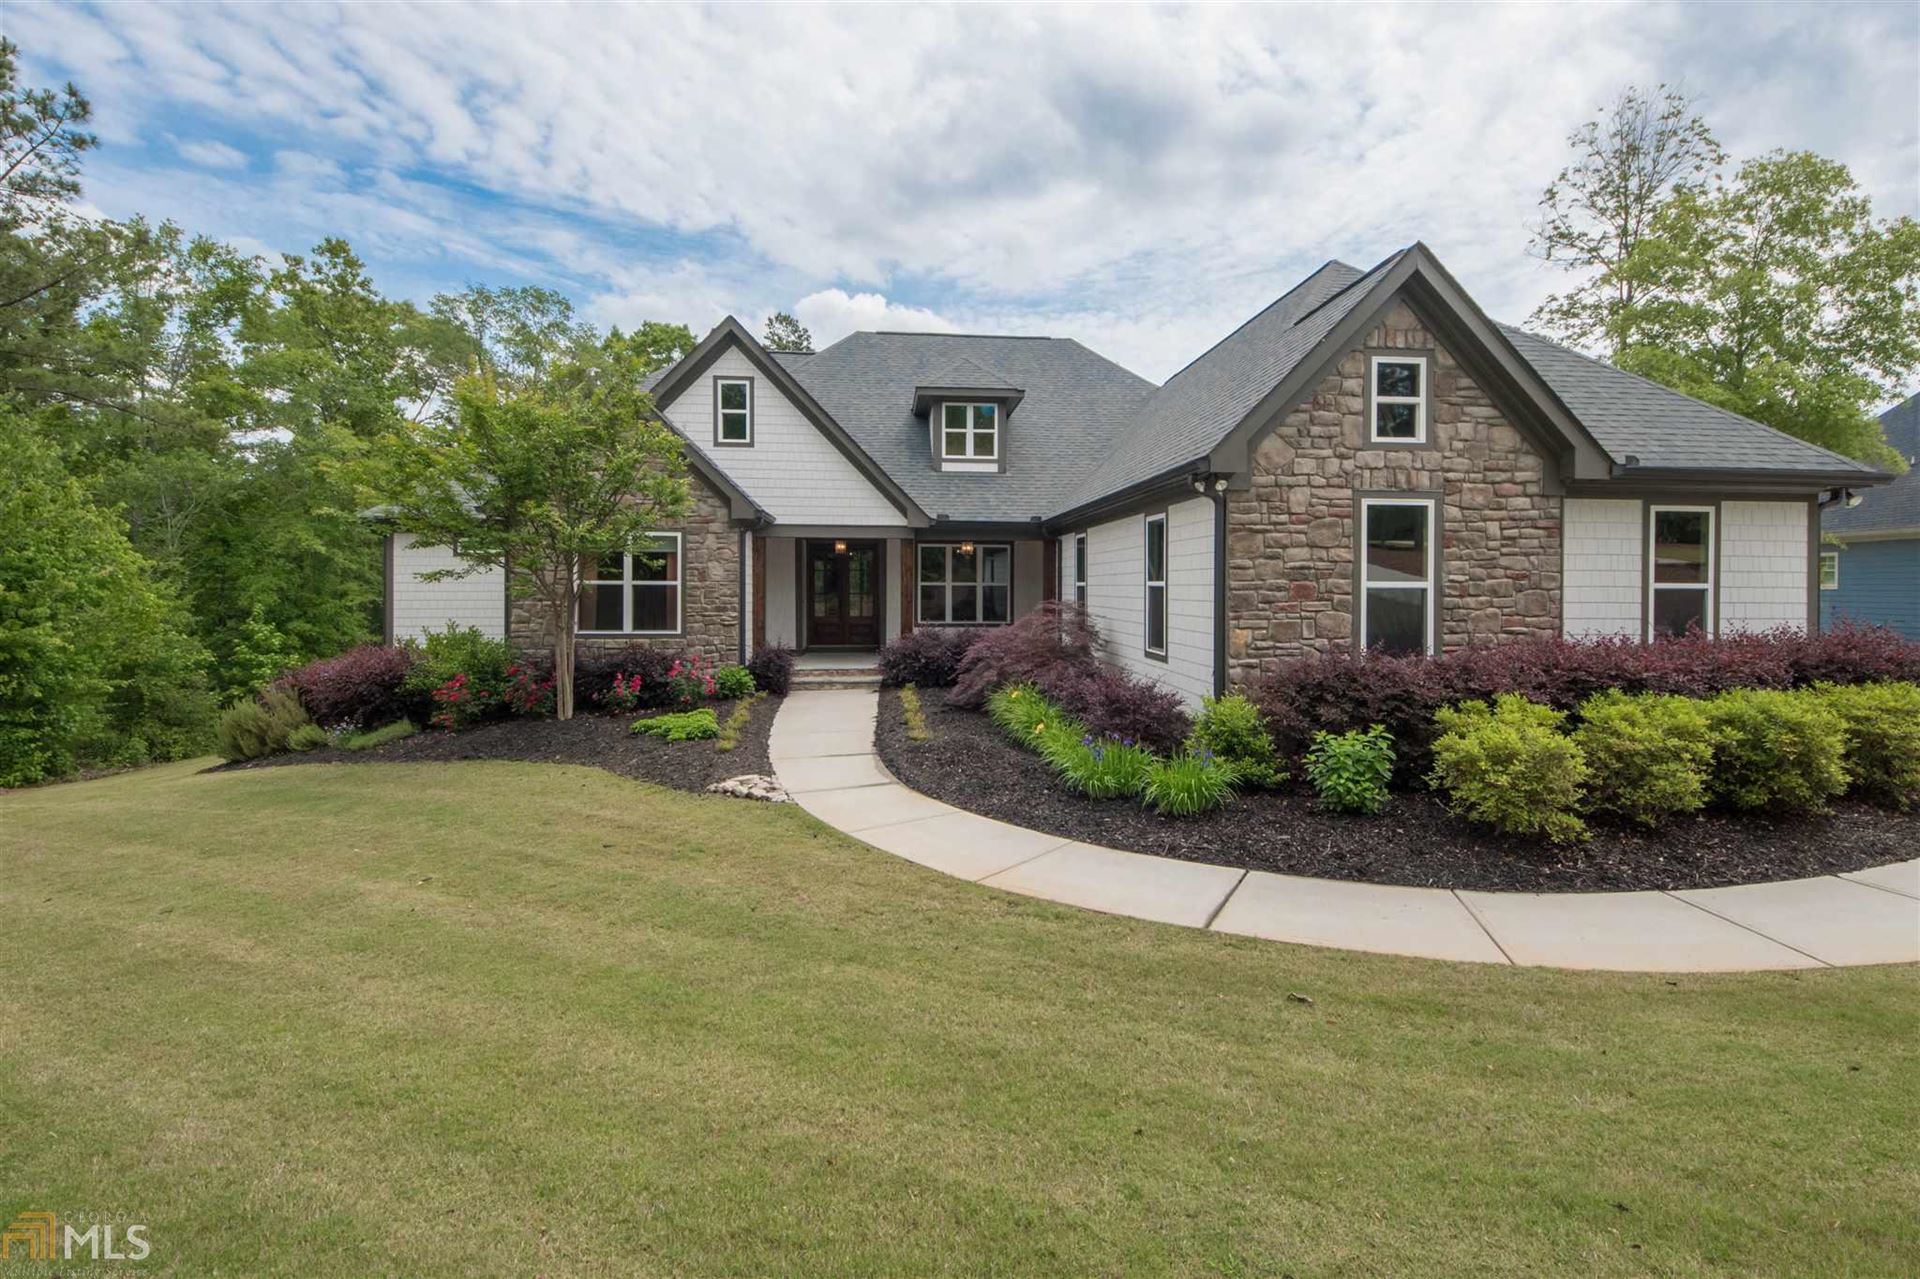 120 Reflections Pt, Fayetteville, GA 30215 - #: 8787244